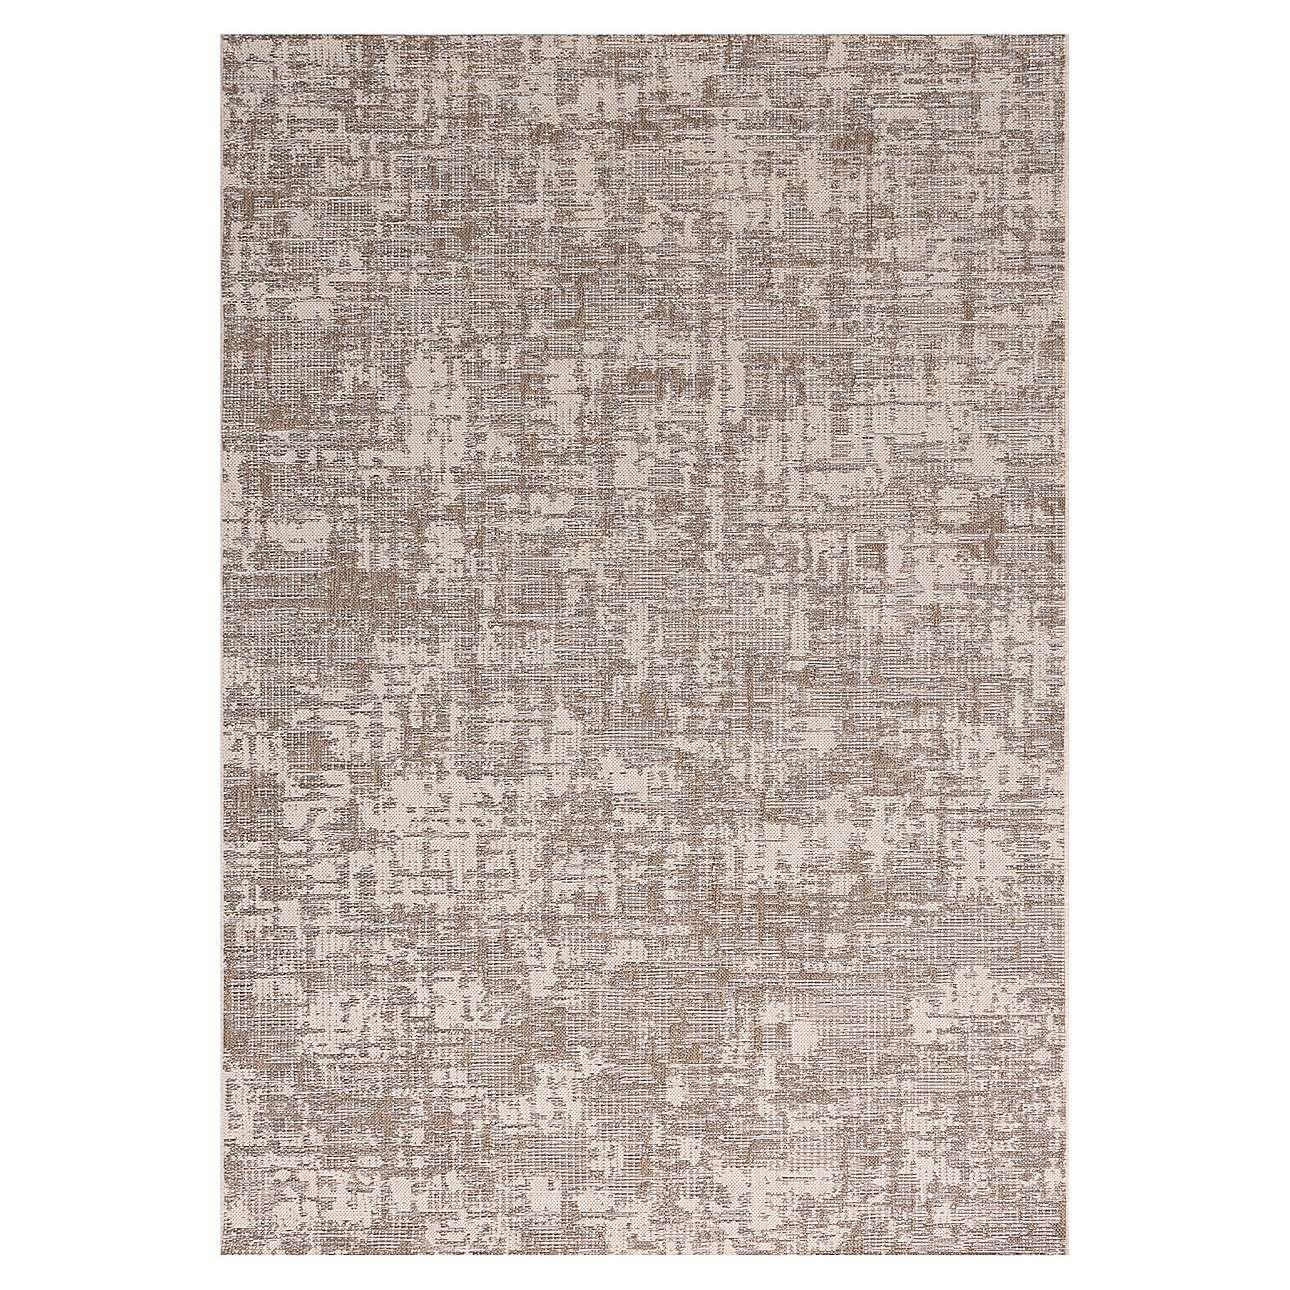 Koberec Breeze wool/cliff grey 160x230cm